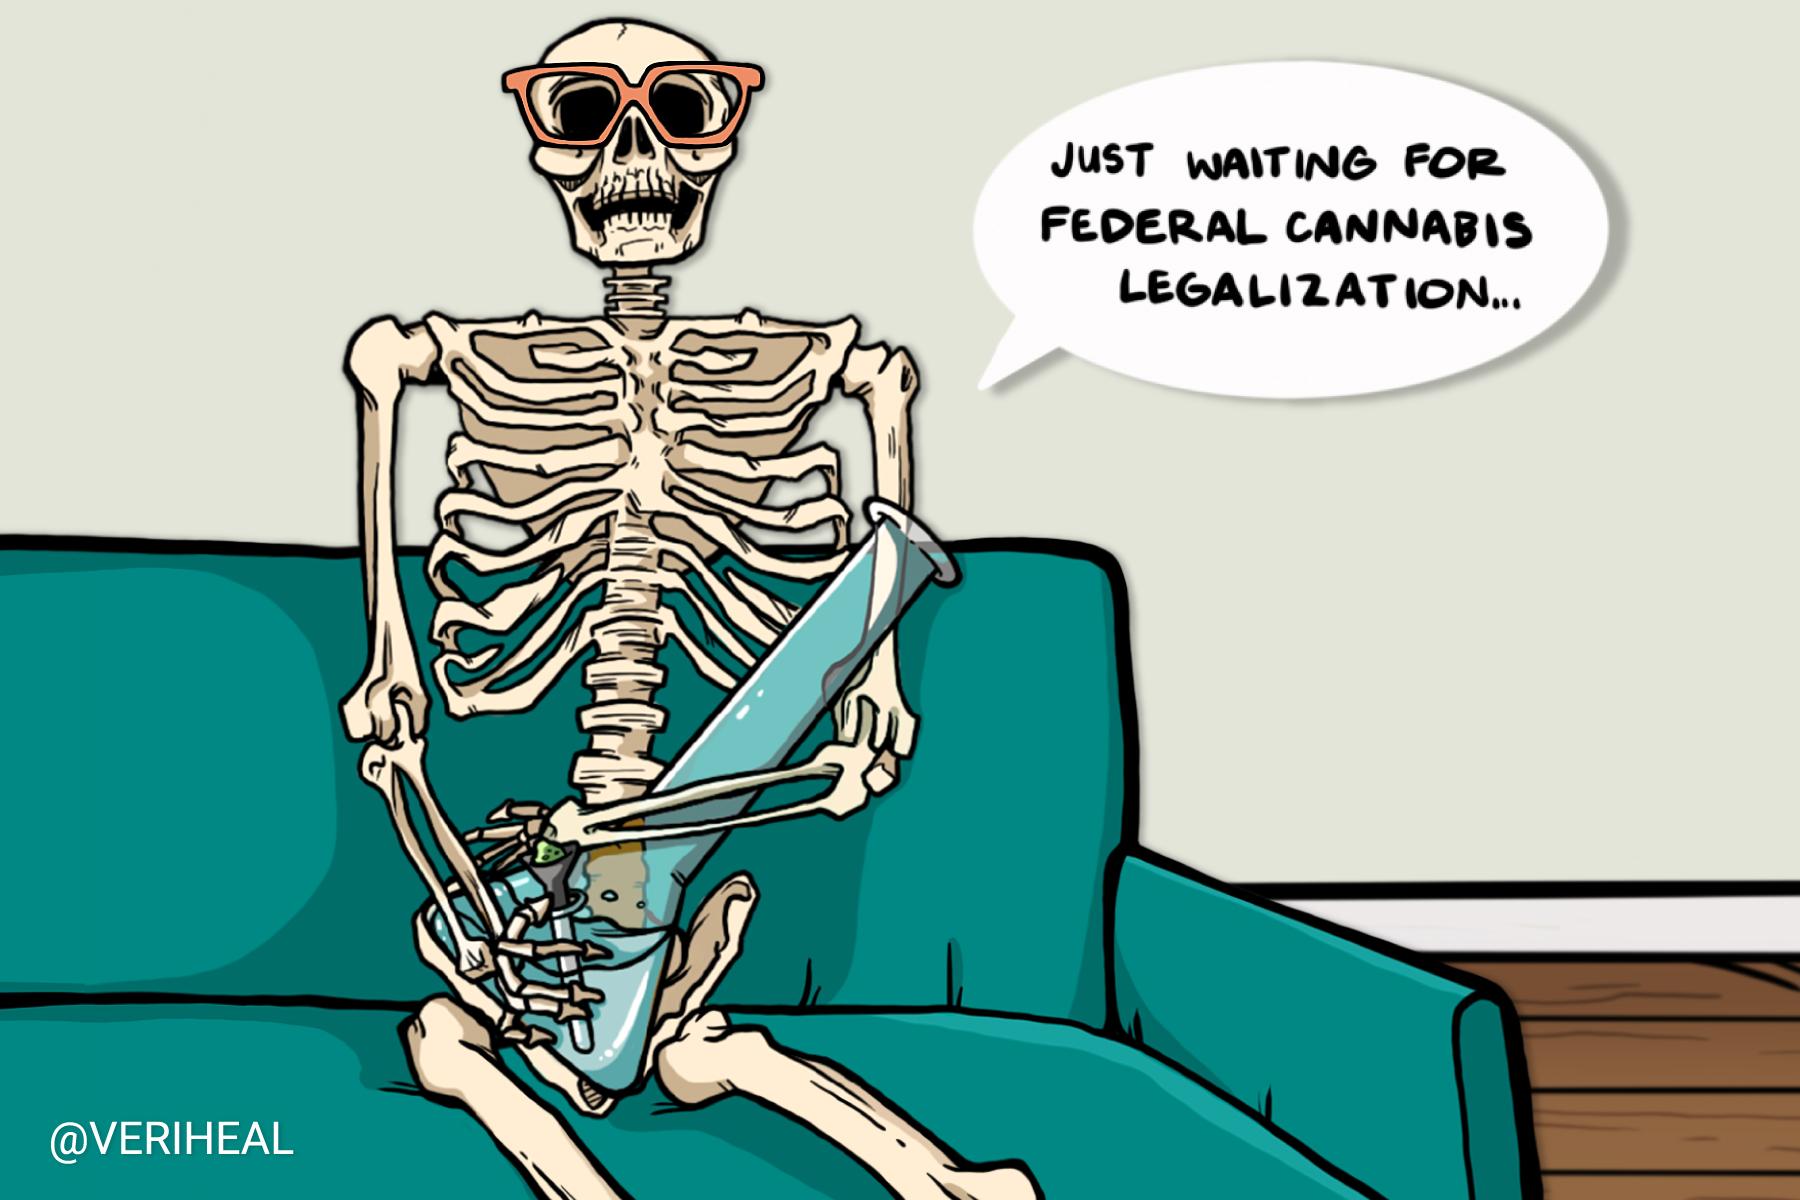 Chuck Schumer and Al Harrington Talk Federal Cannabis Legislation